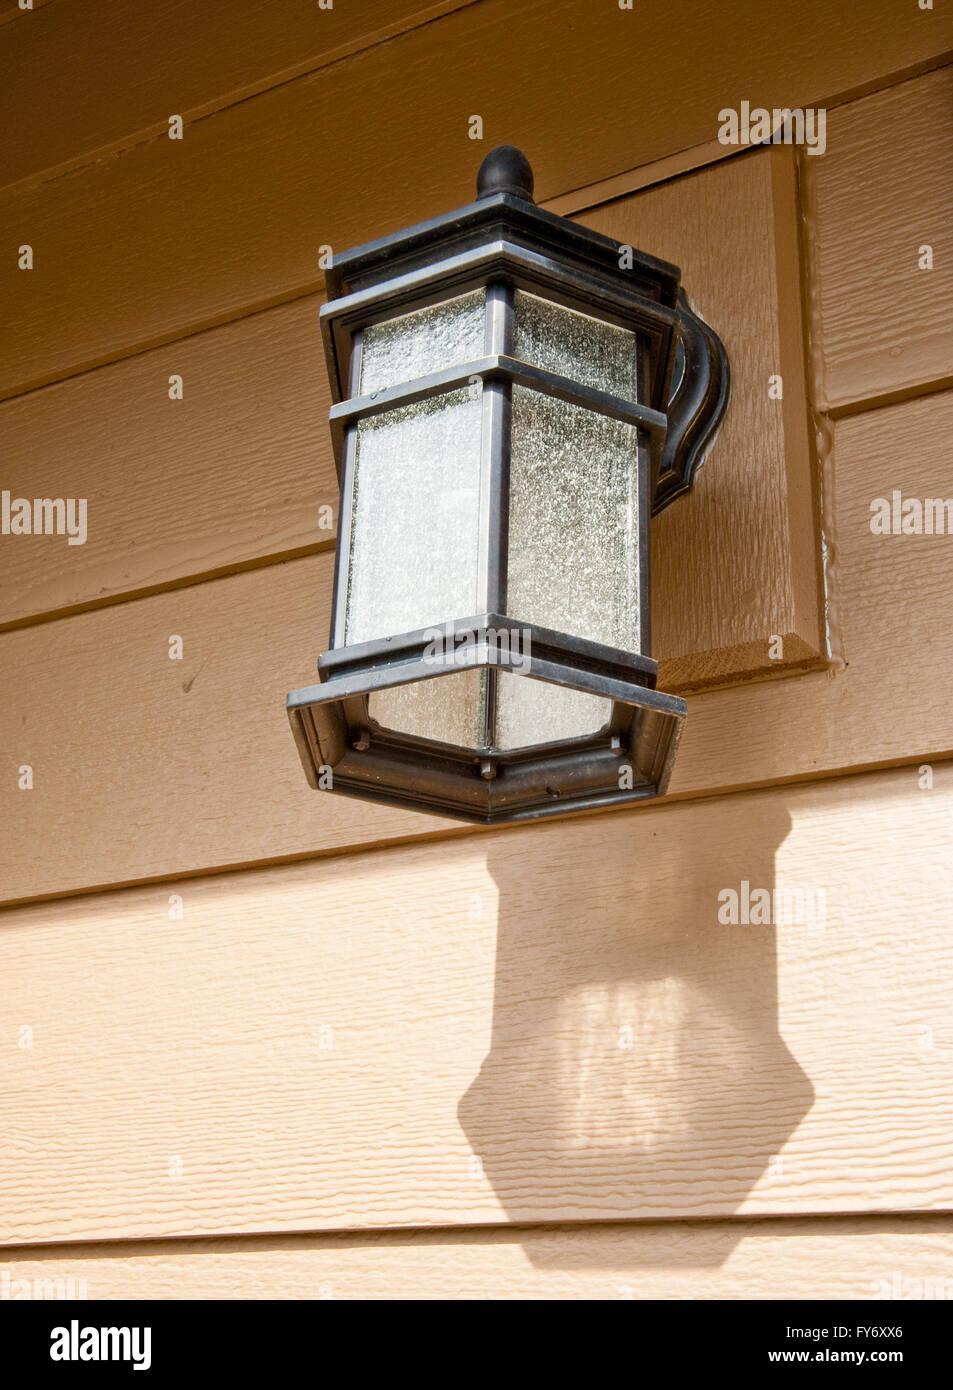 modern porch light stock photo royalty free image   alamy - modern porch light